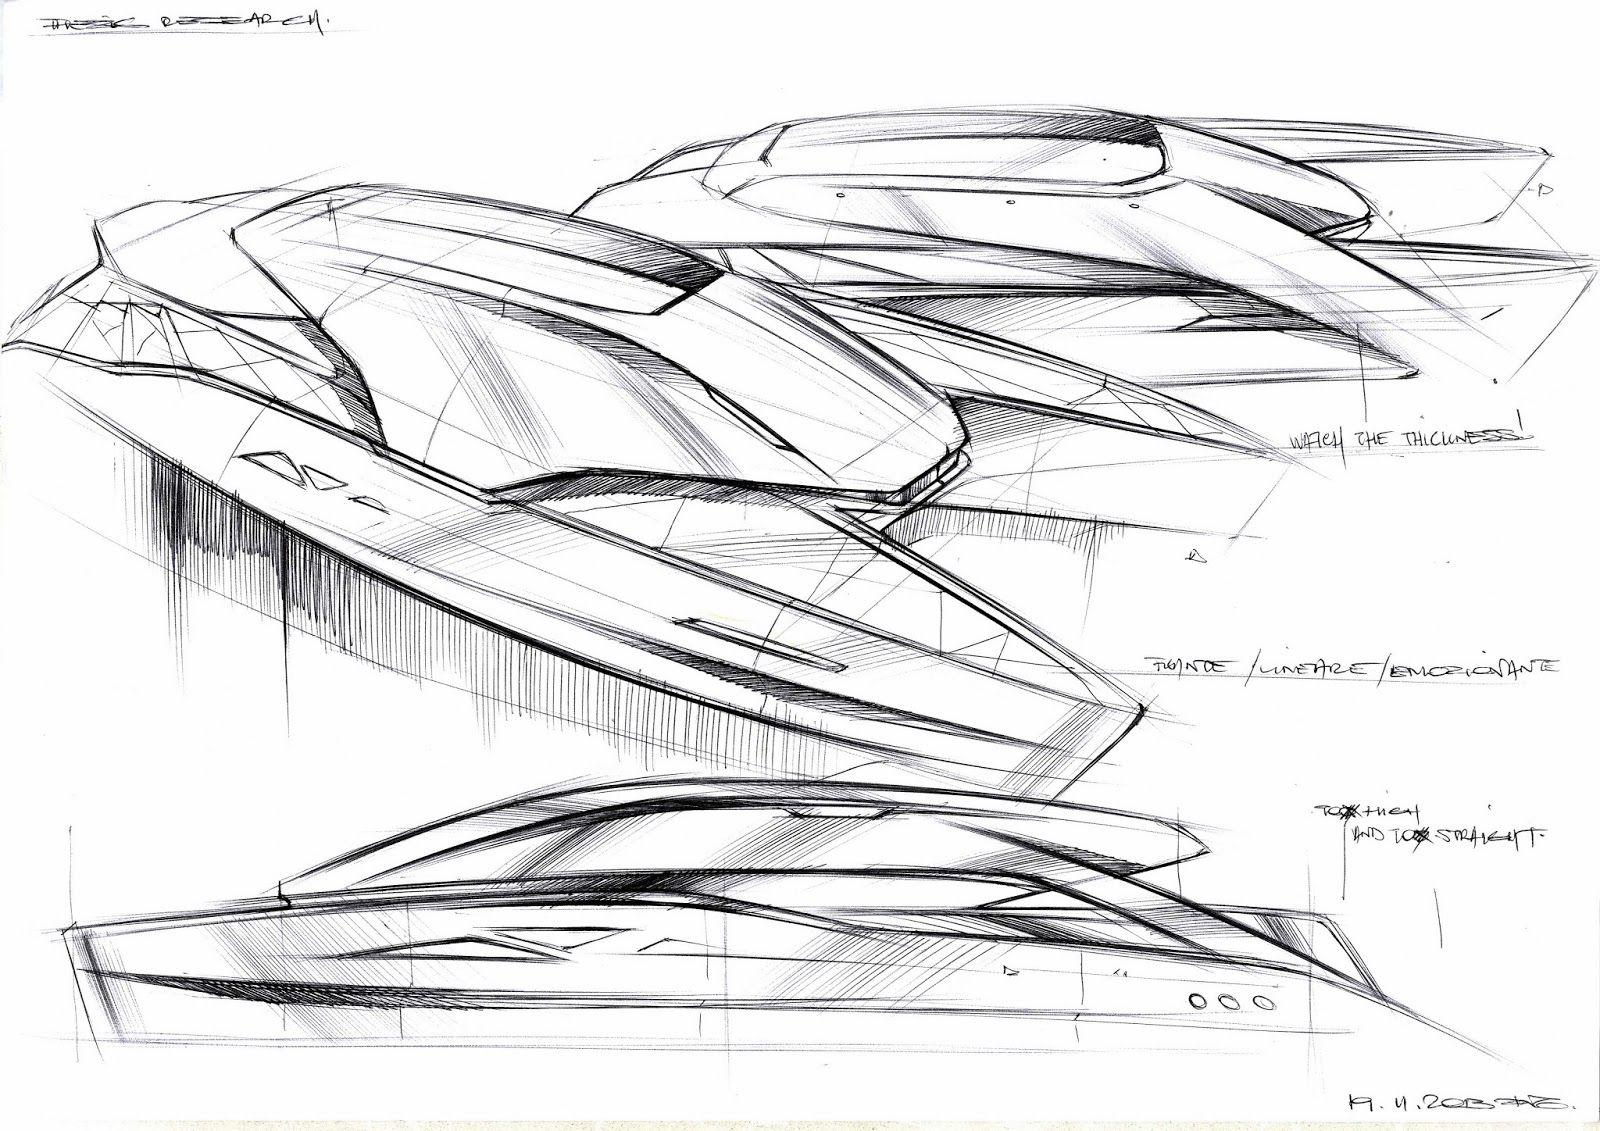 catamaran key sketch jpg  1600 u00d71131